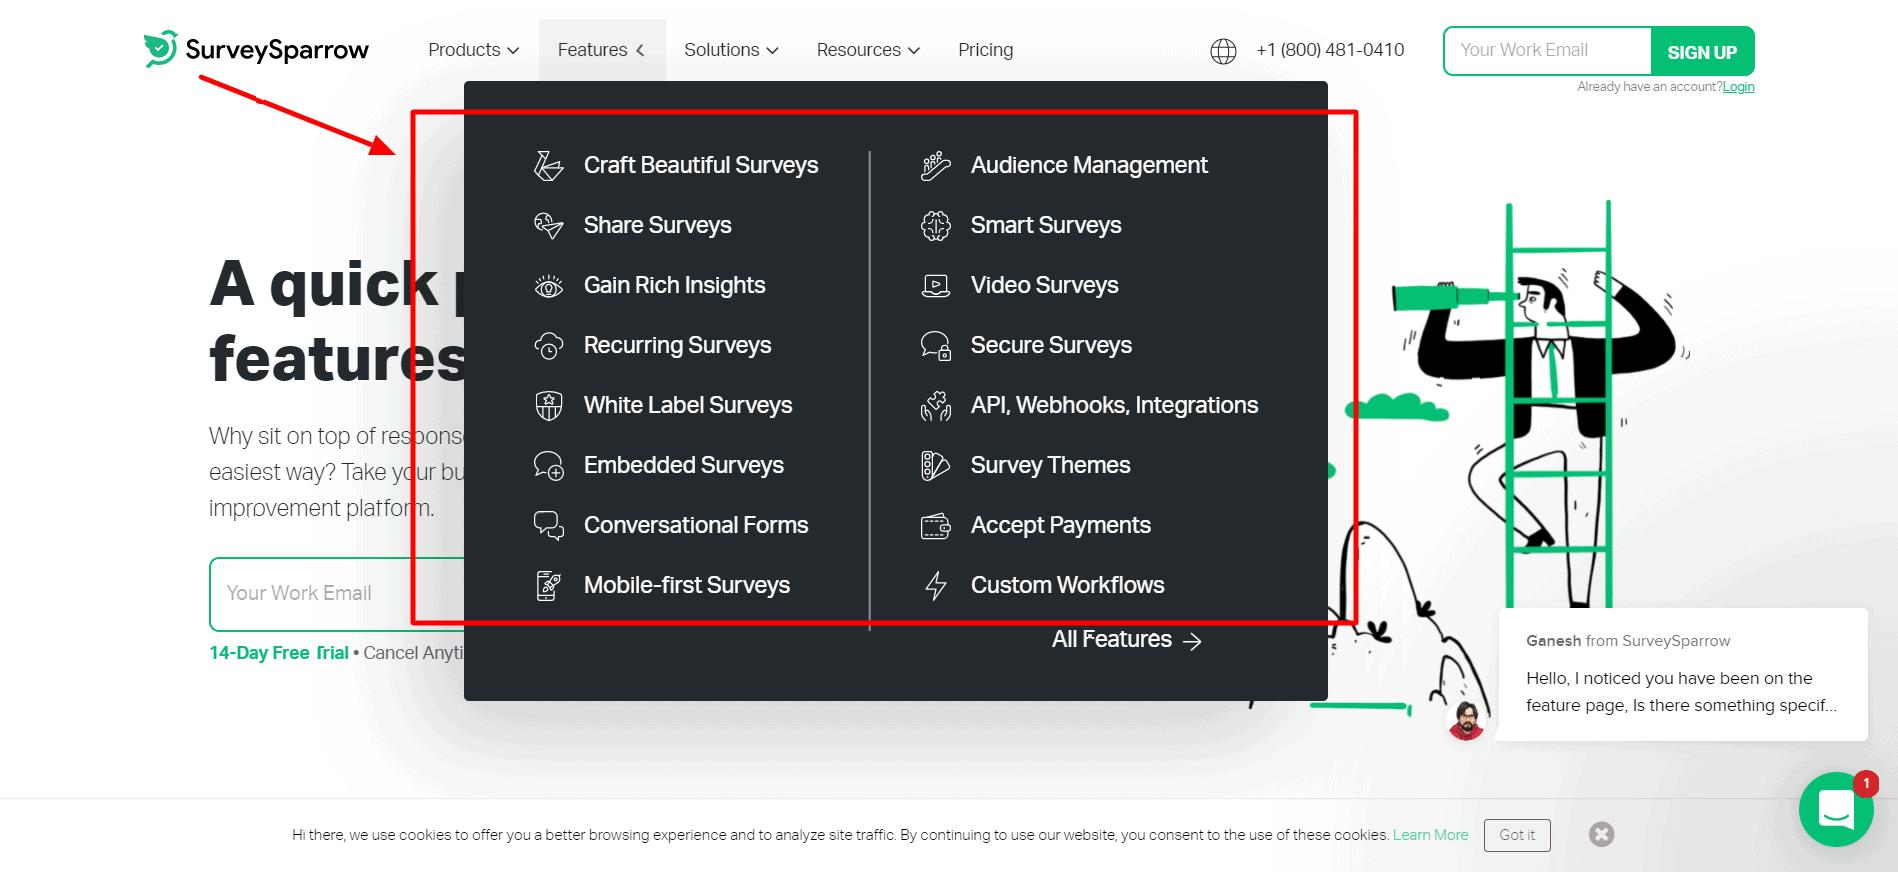 SurveySparrow promo code- Features